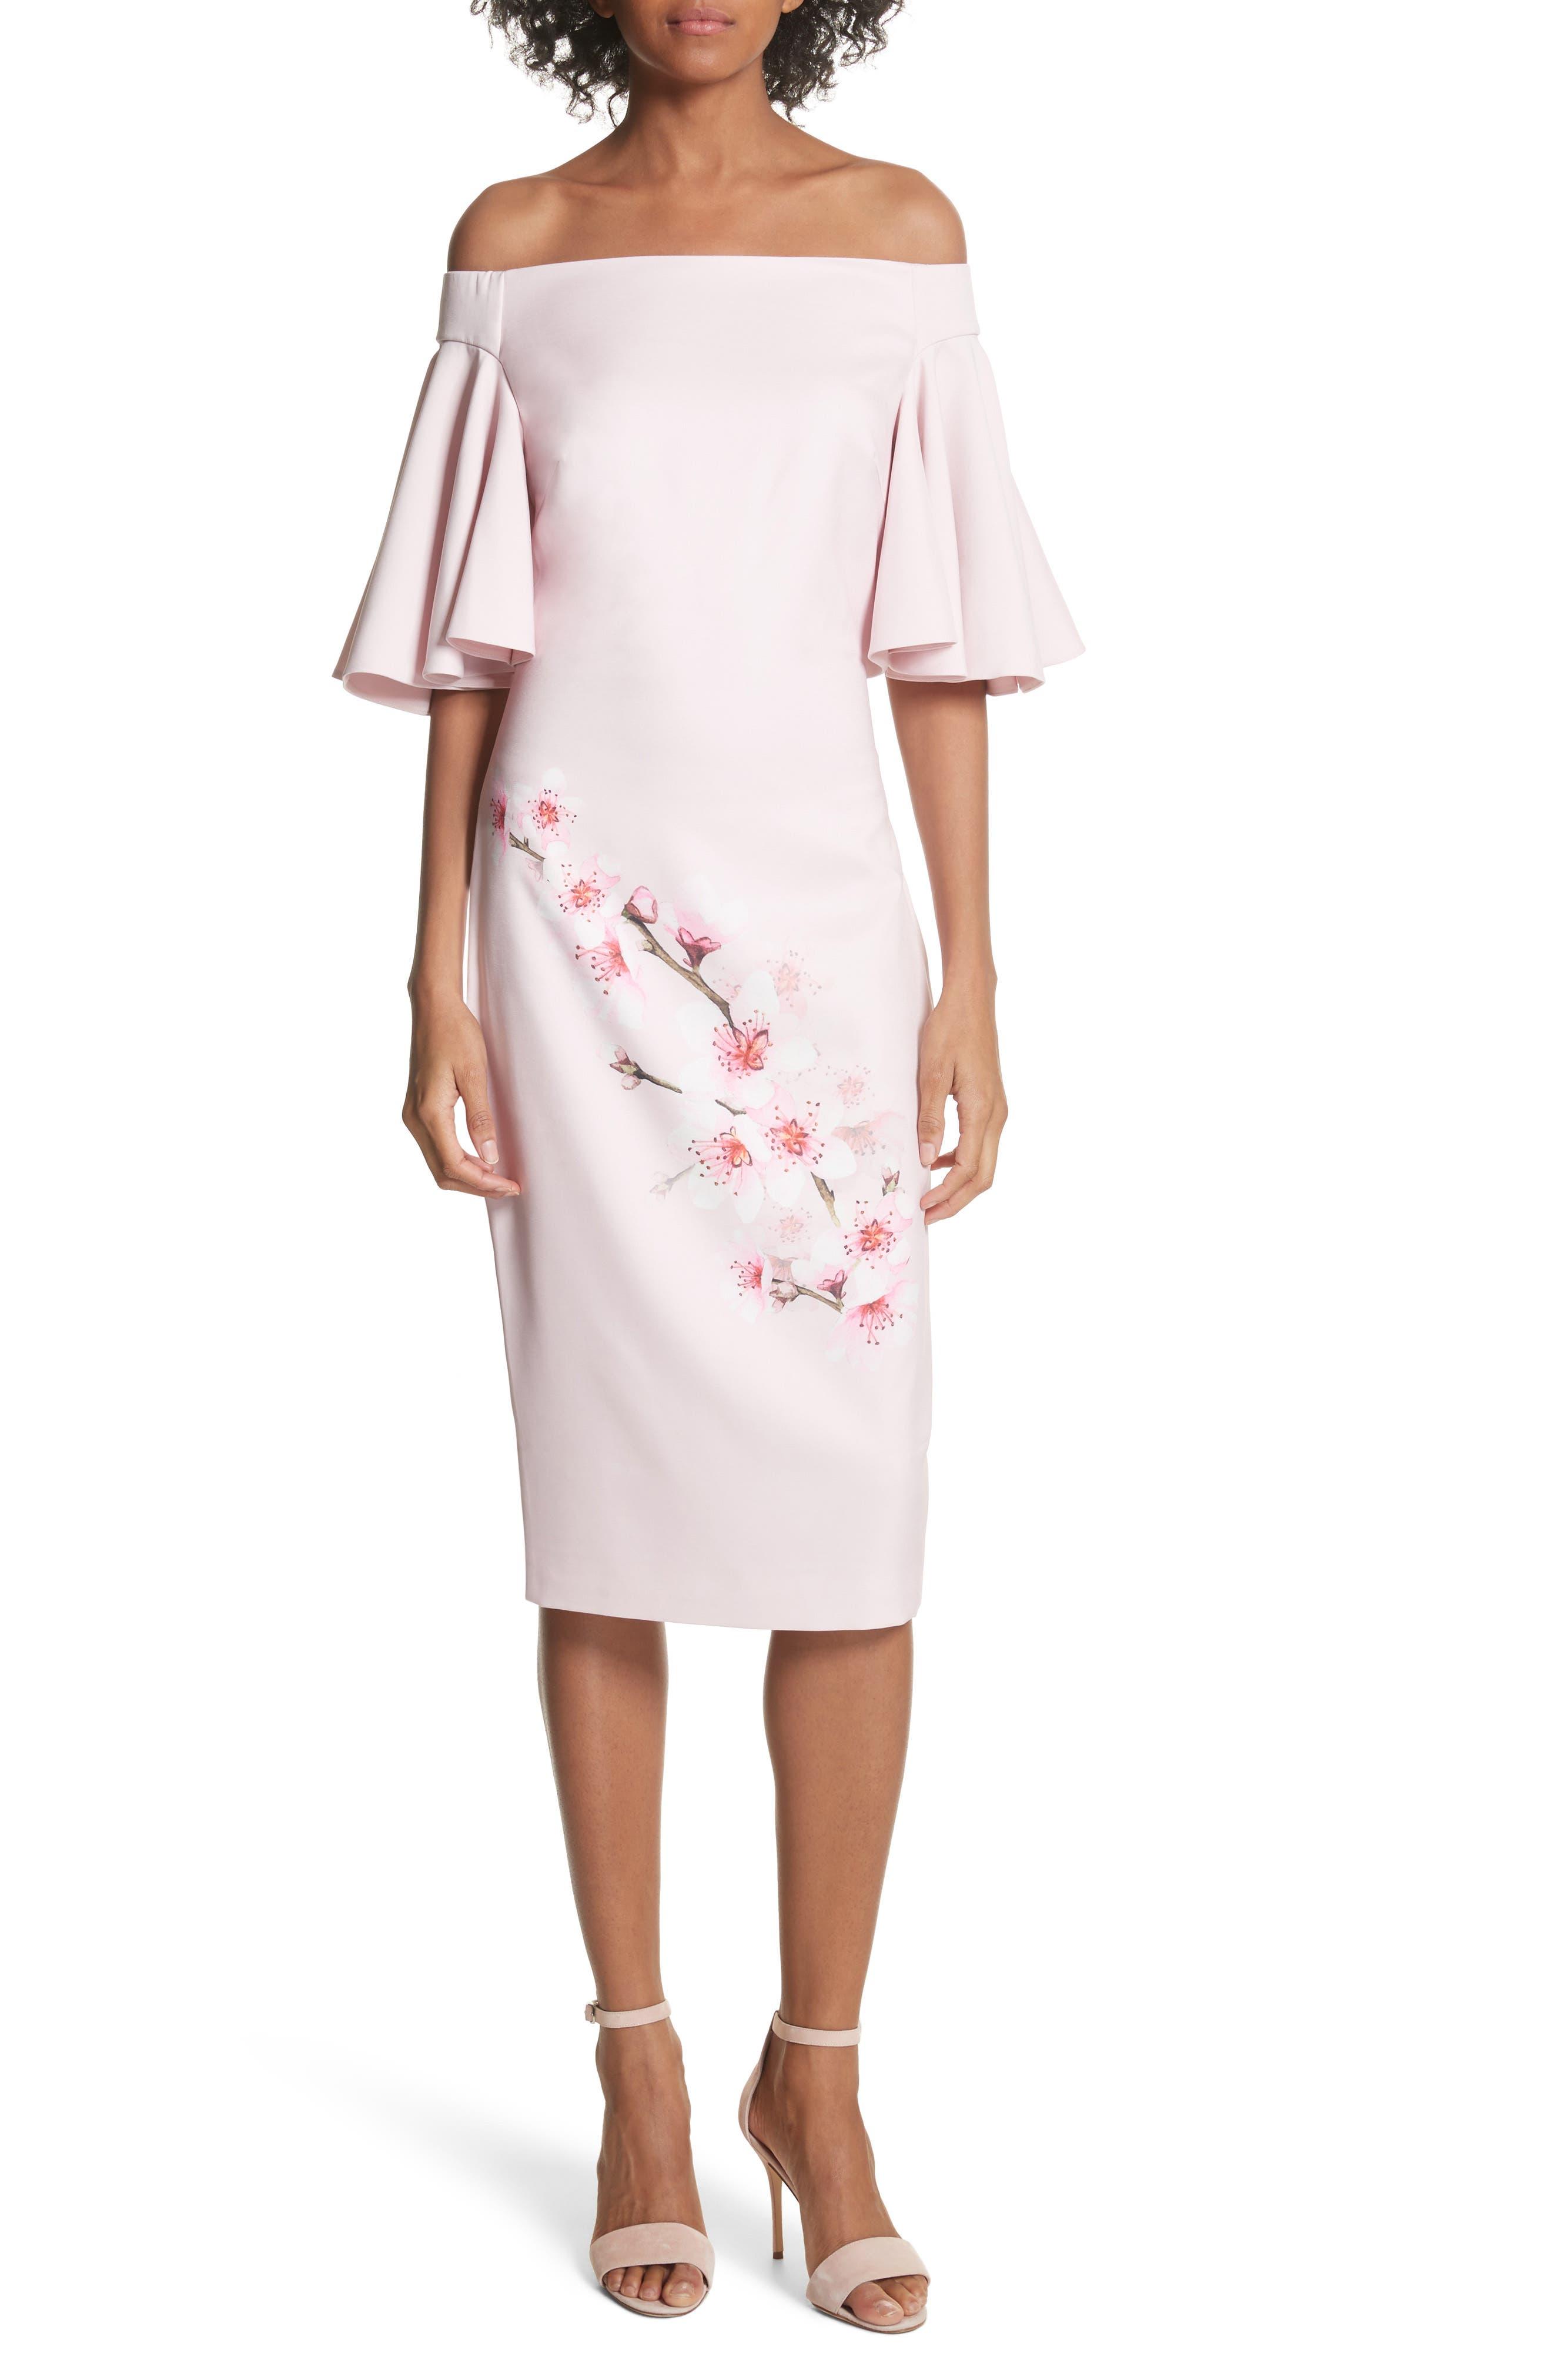 Soft Blossom Off the Shoulder Sheath Dress,                             Main thumbnail 1, color,                             683